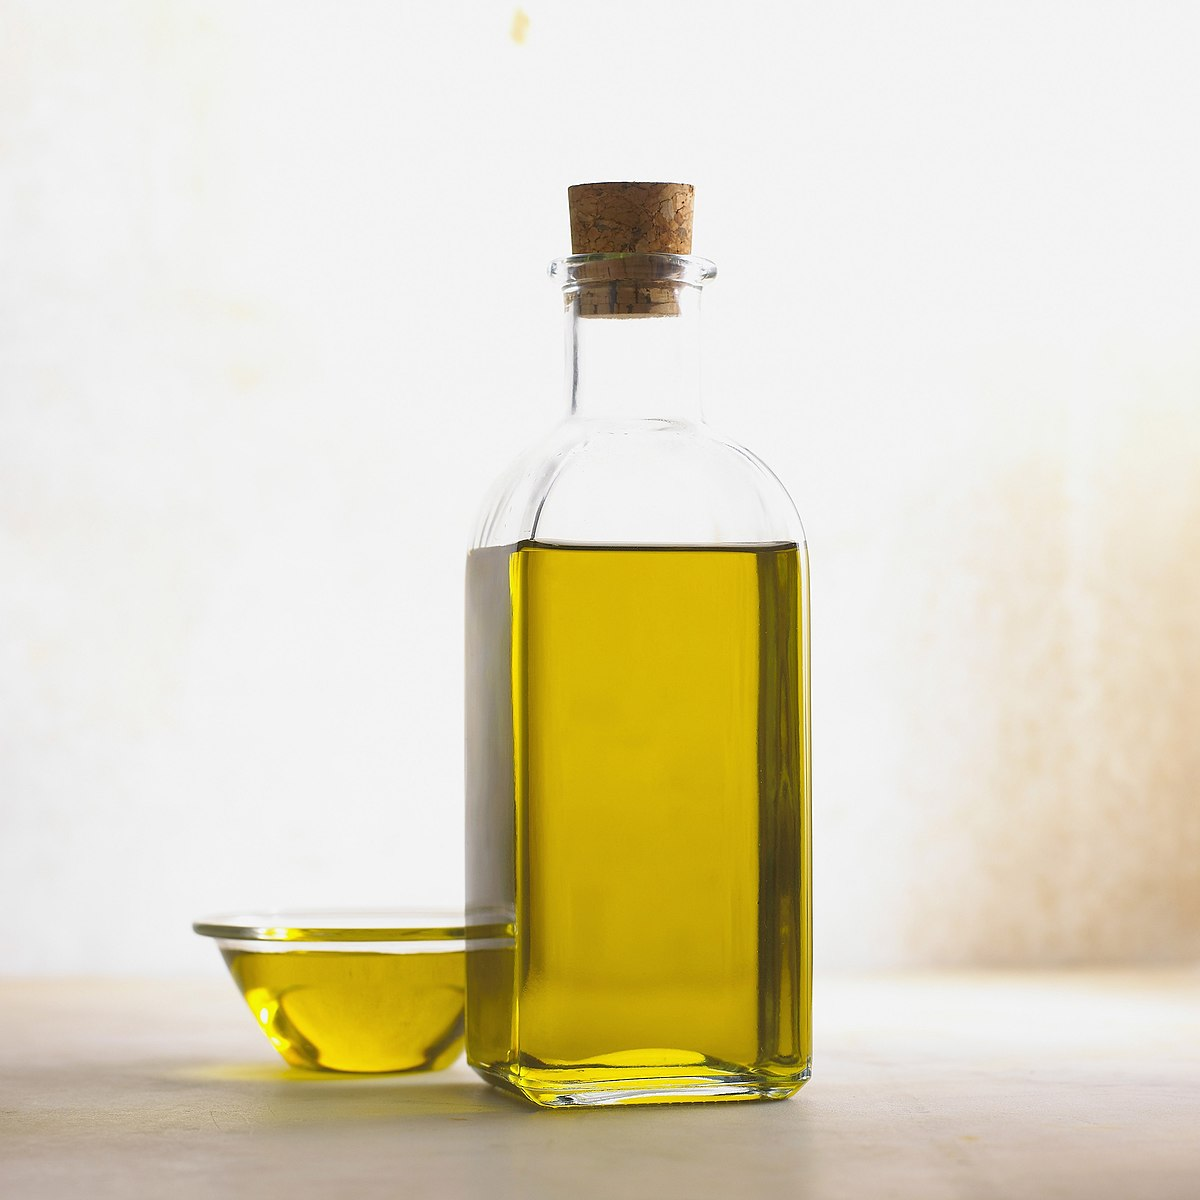 Garlic oil - Wikipedia